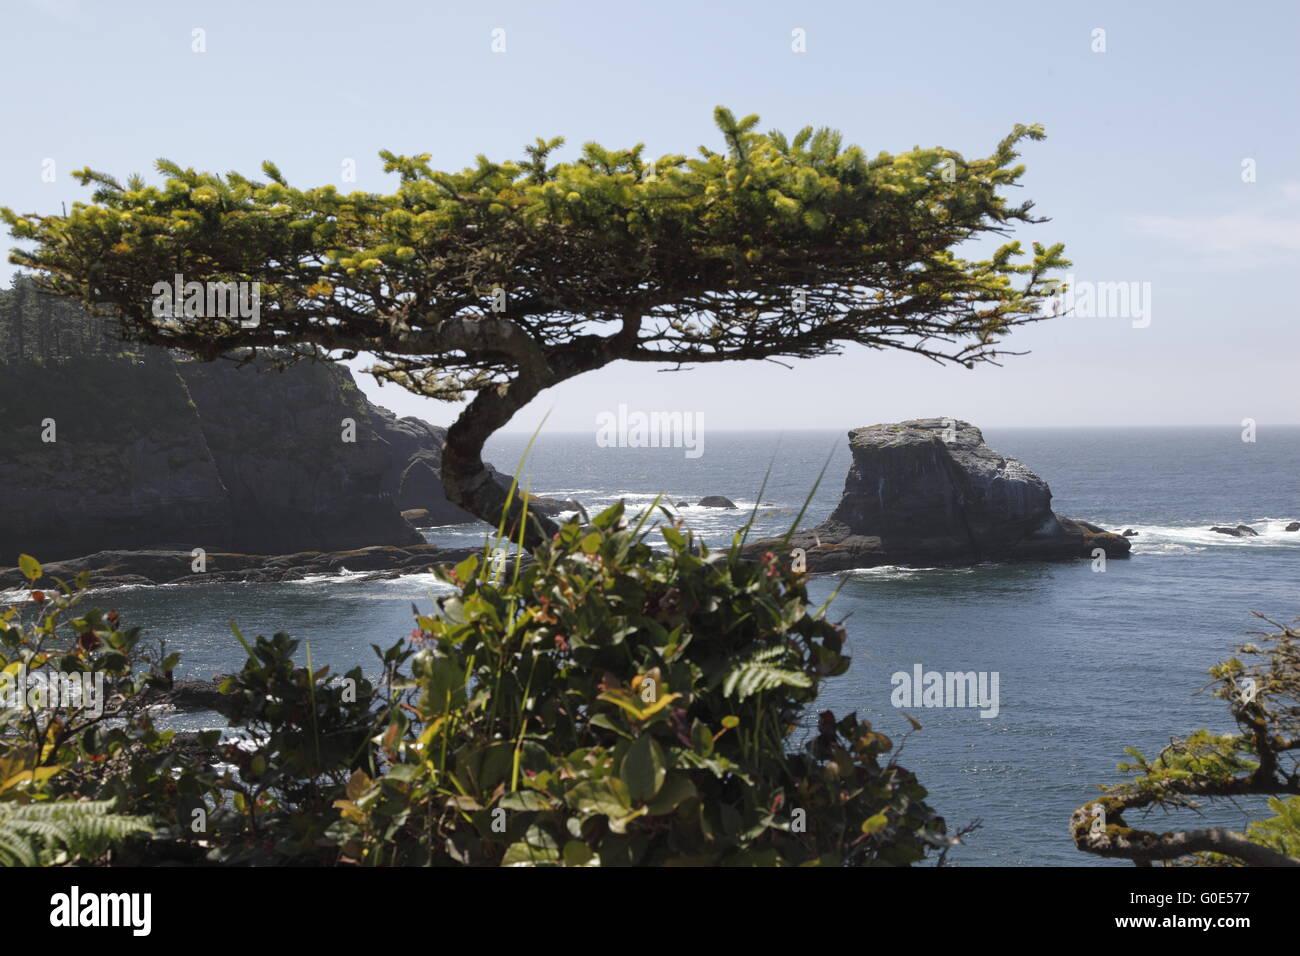 Warped tree, Cape Flattery - Stock Image